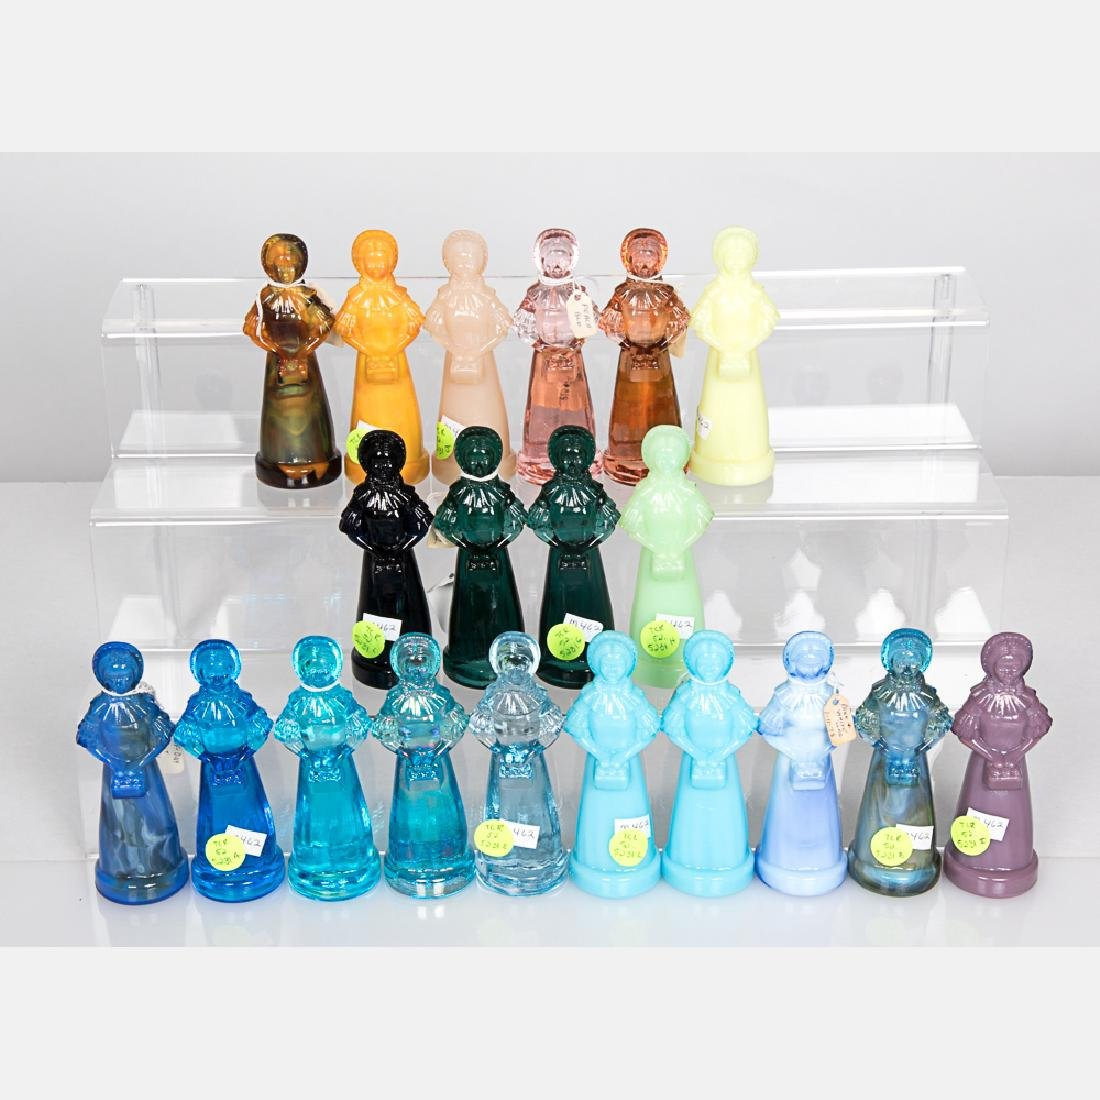 A Collection of Twenty Colored Glass 'Priscilla